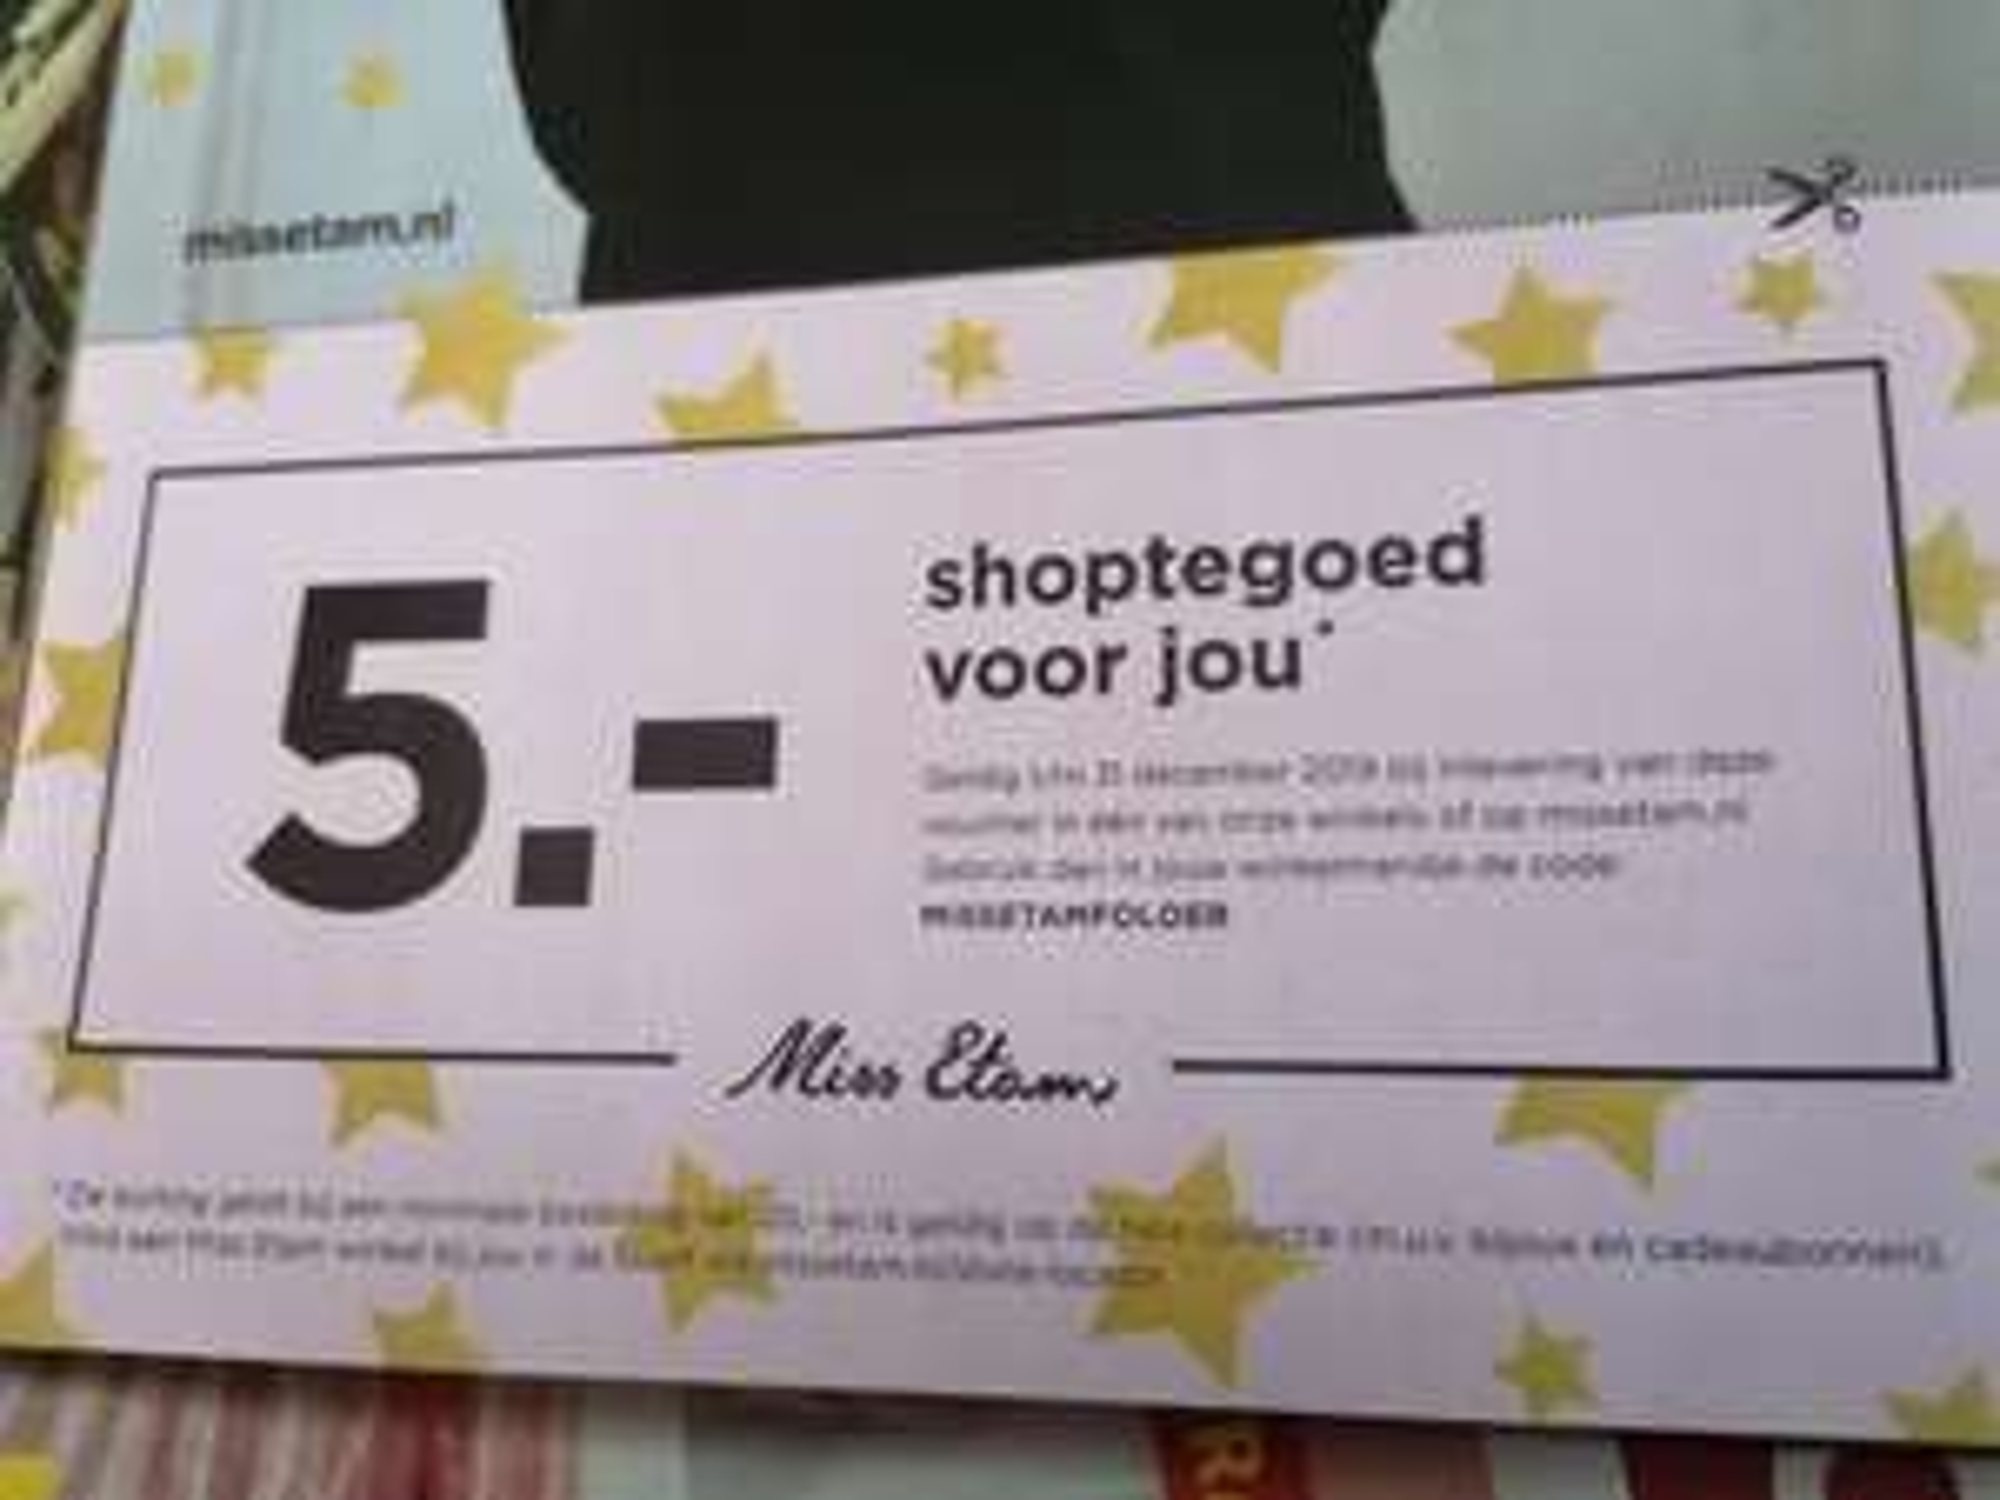 Shoptegoed